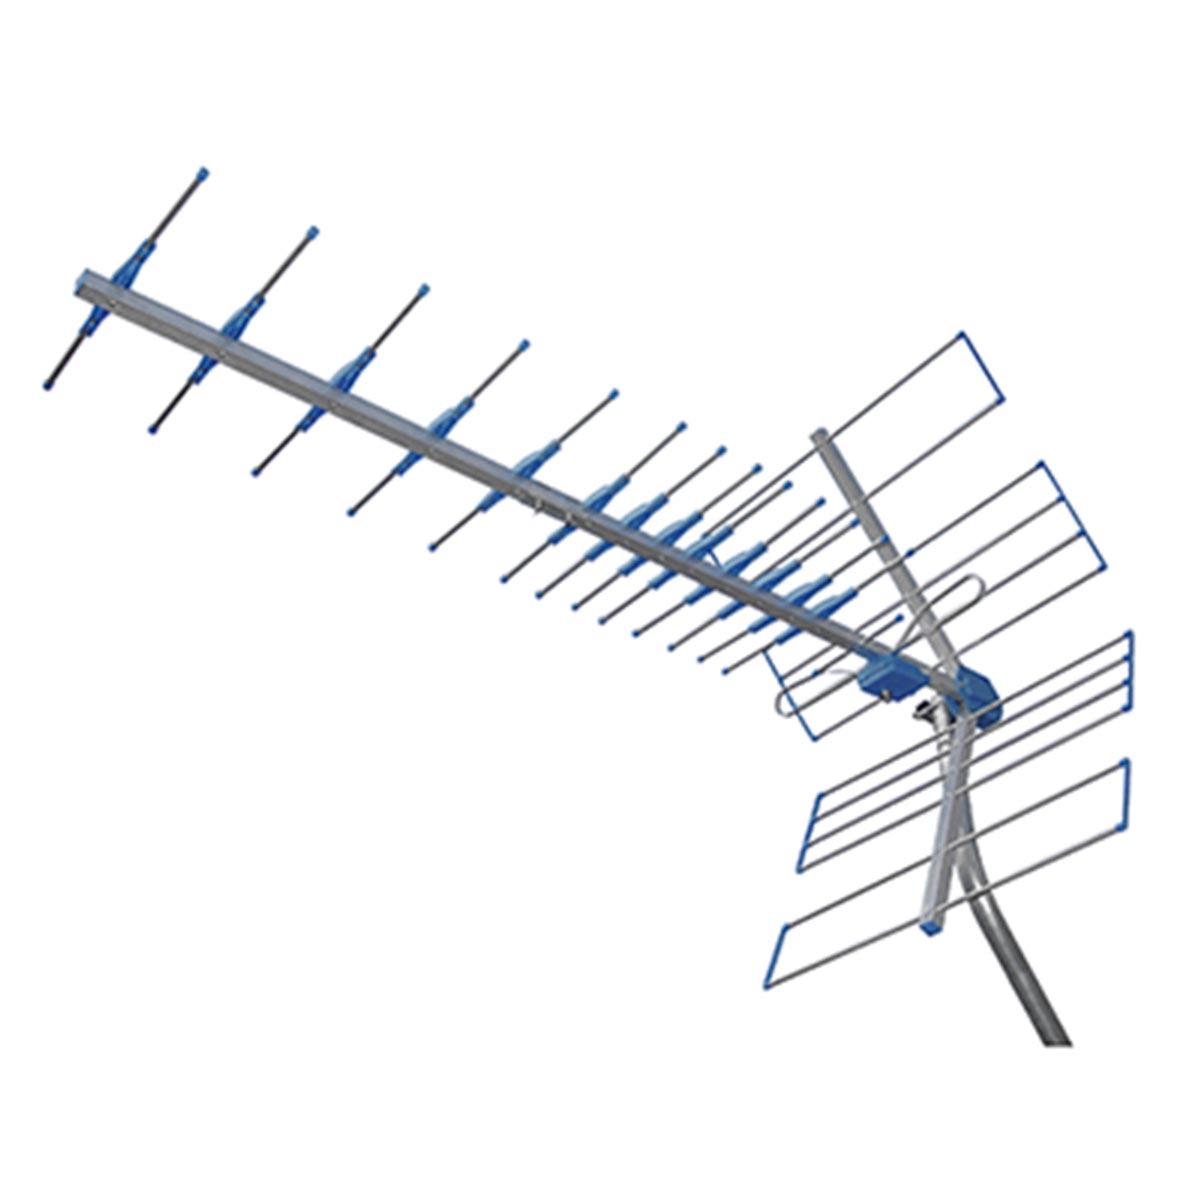 PROHD1100 - Antena Externa UHF Digital Yagi PROHD 1100 - ProEletronic